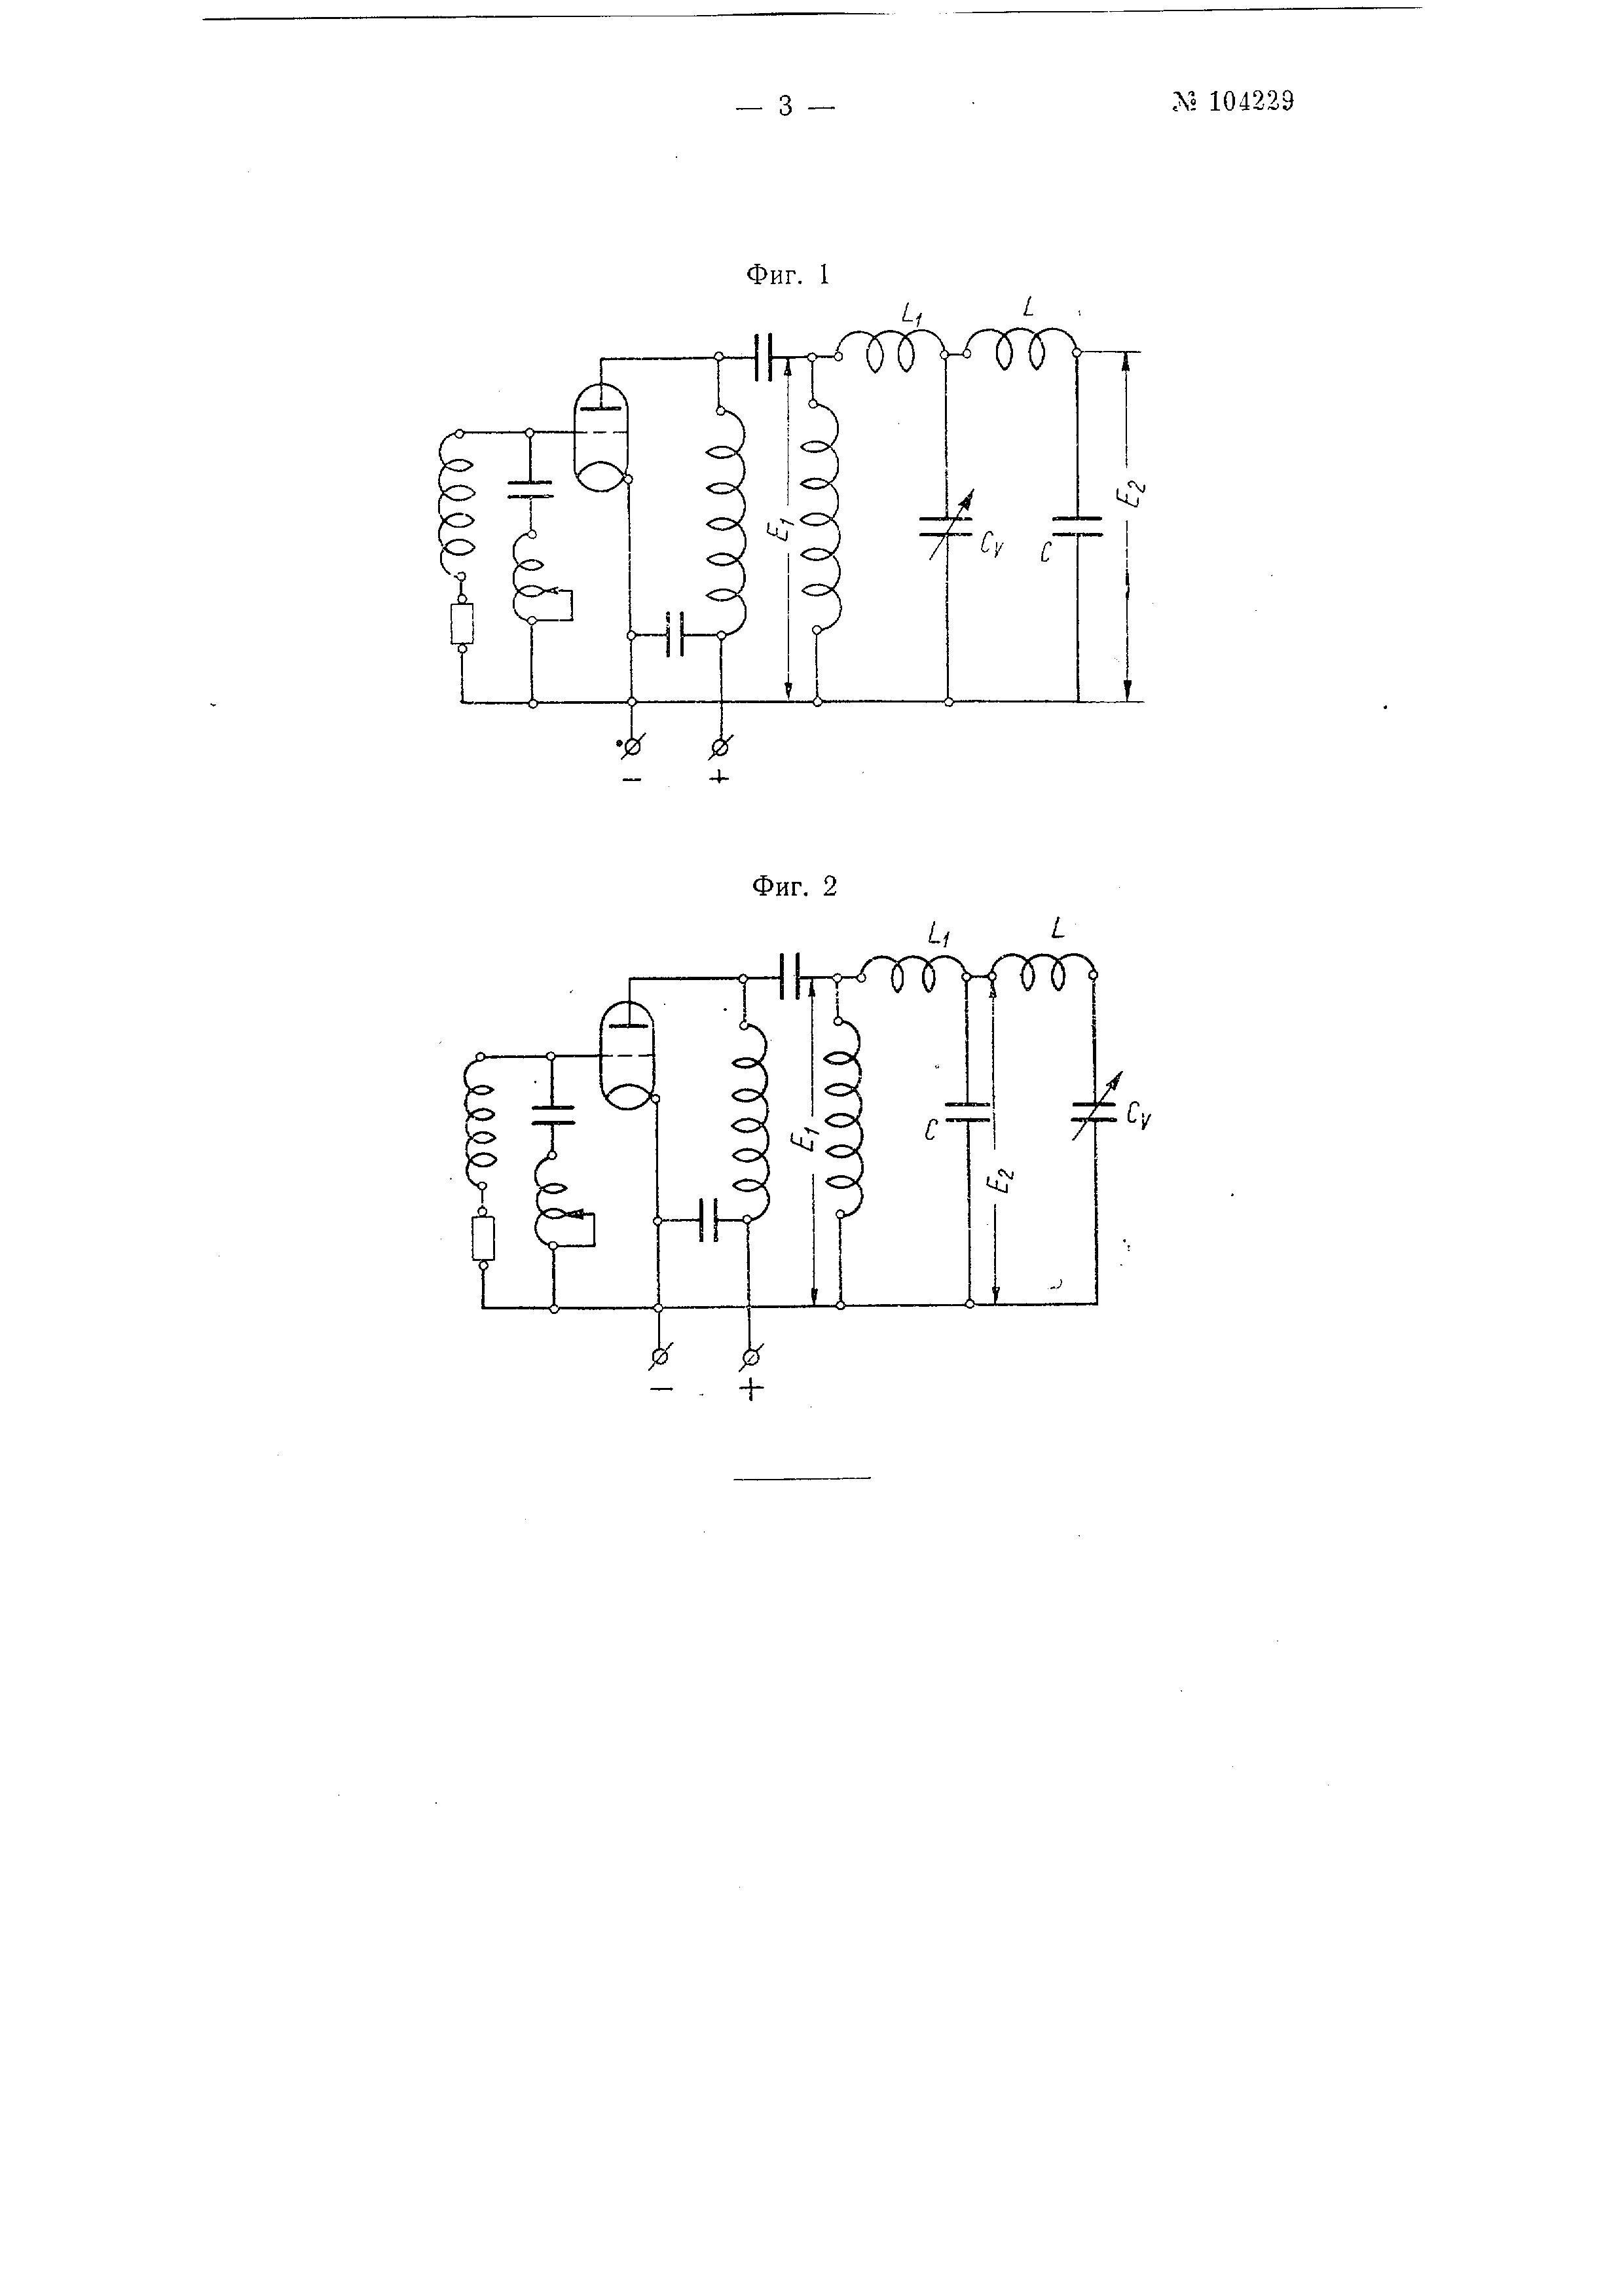 Драйвер шагового двигателя схема плата